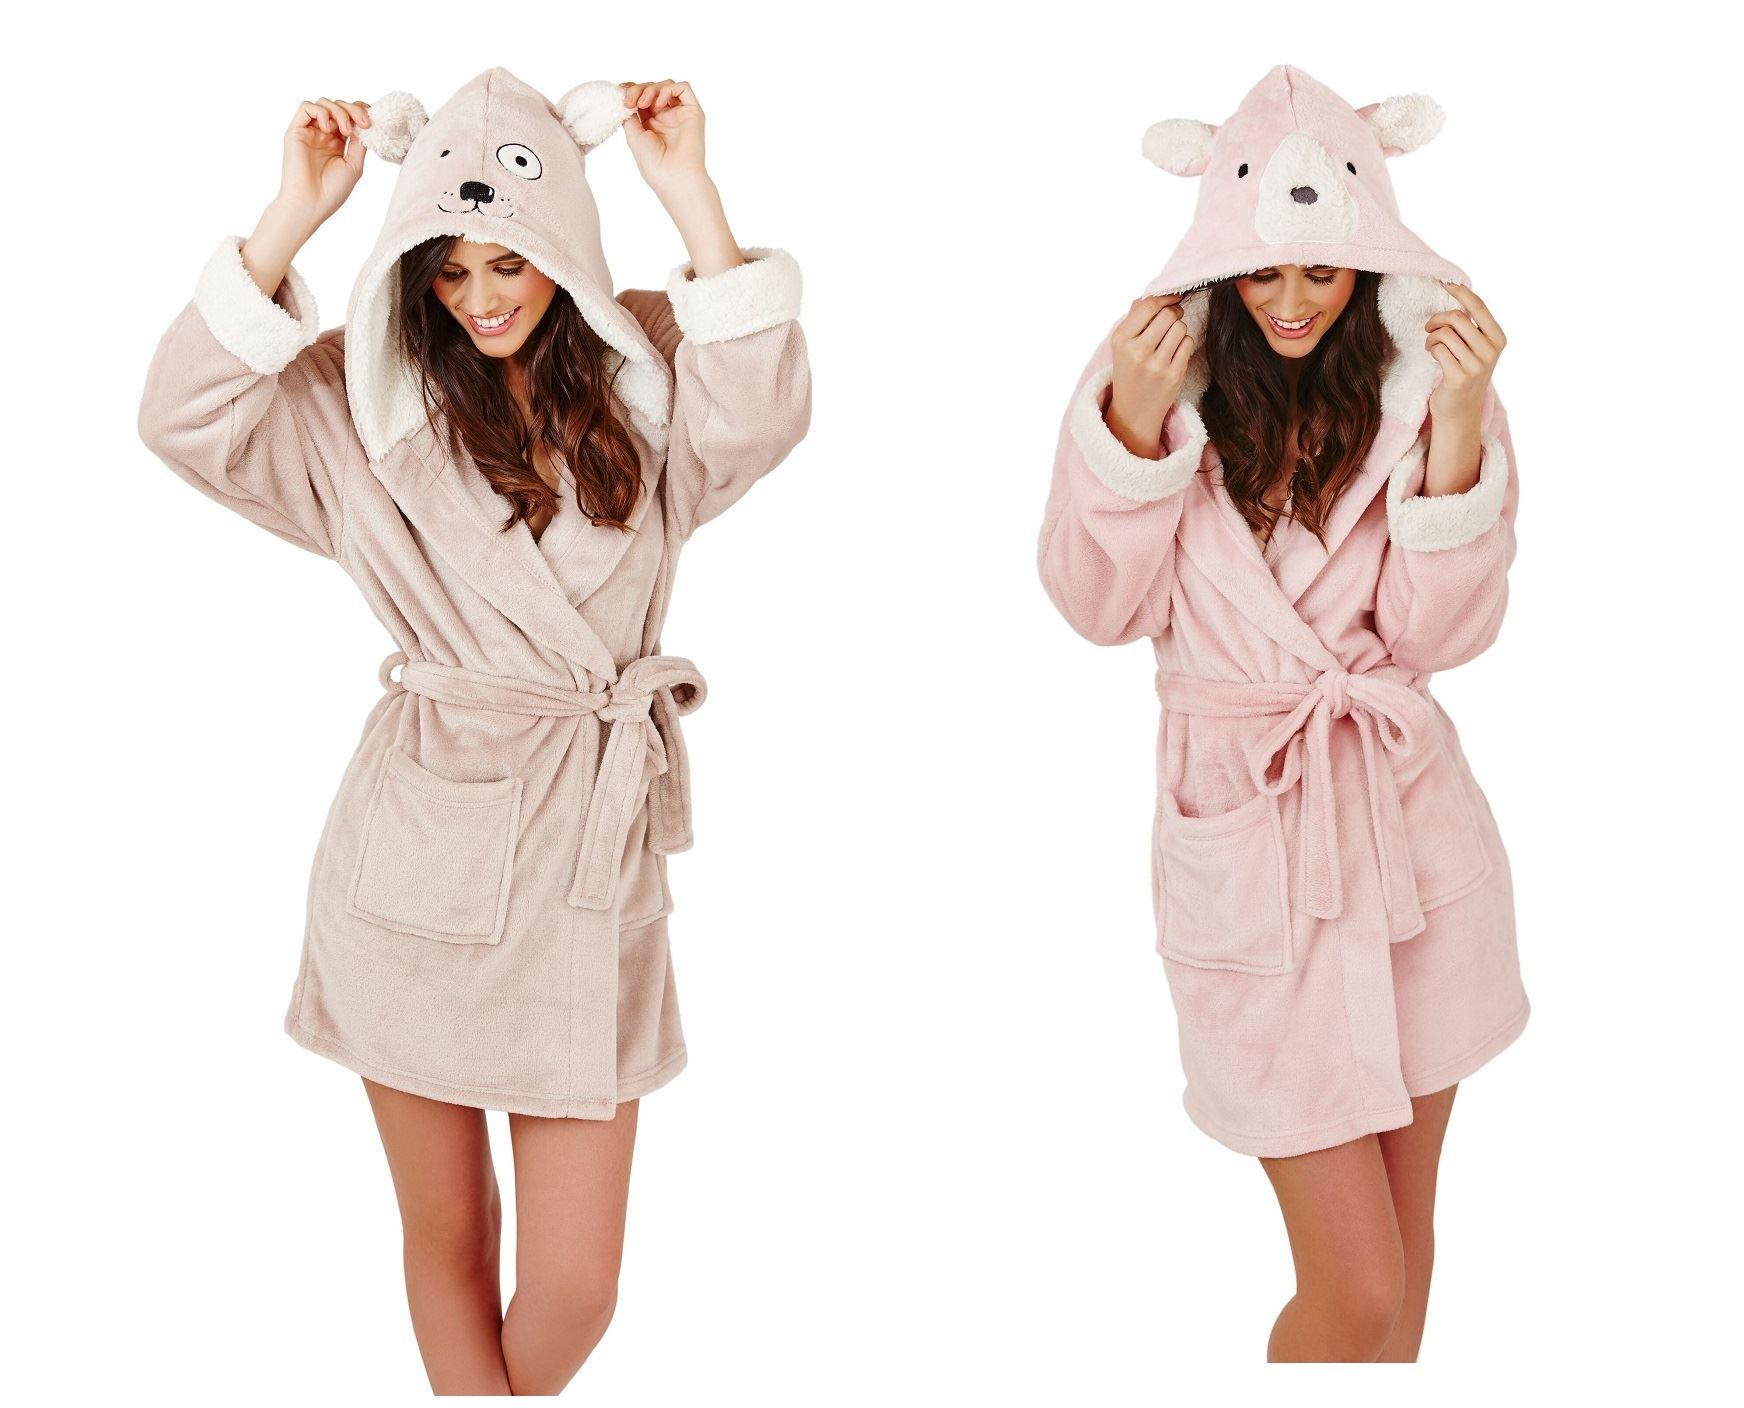 Ladies dressing gown bathrobe robe animal house coat bath robe | eBay